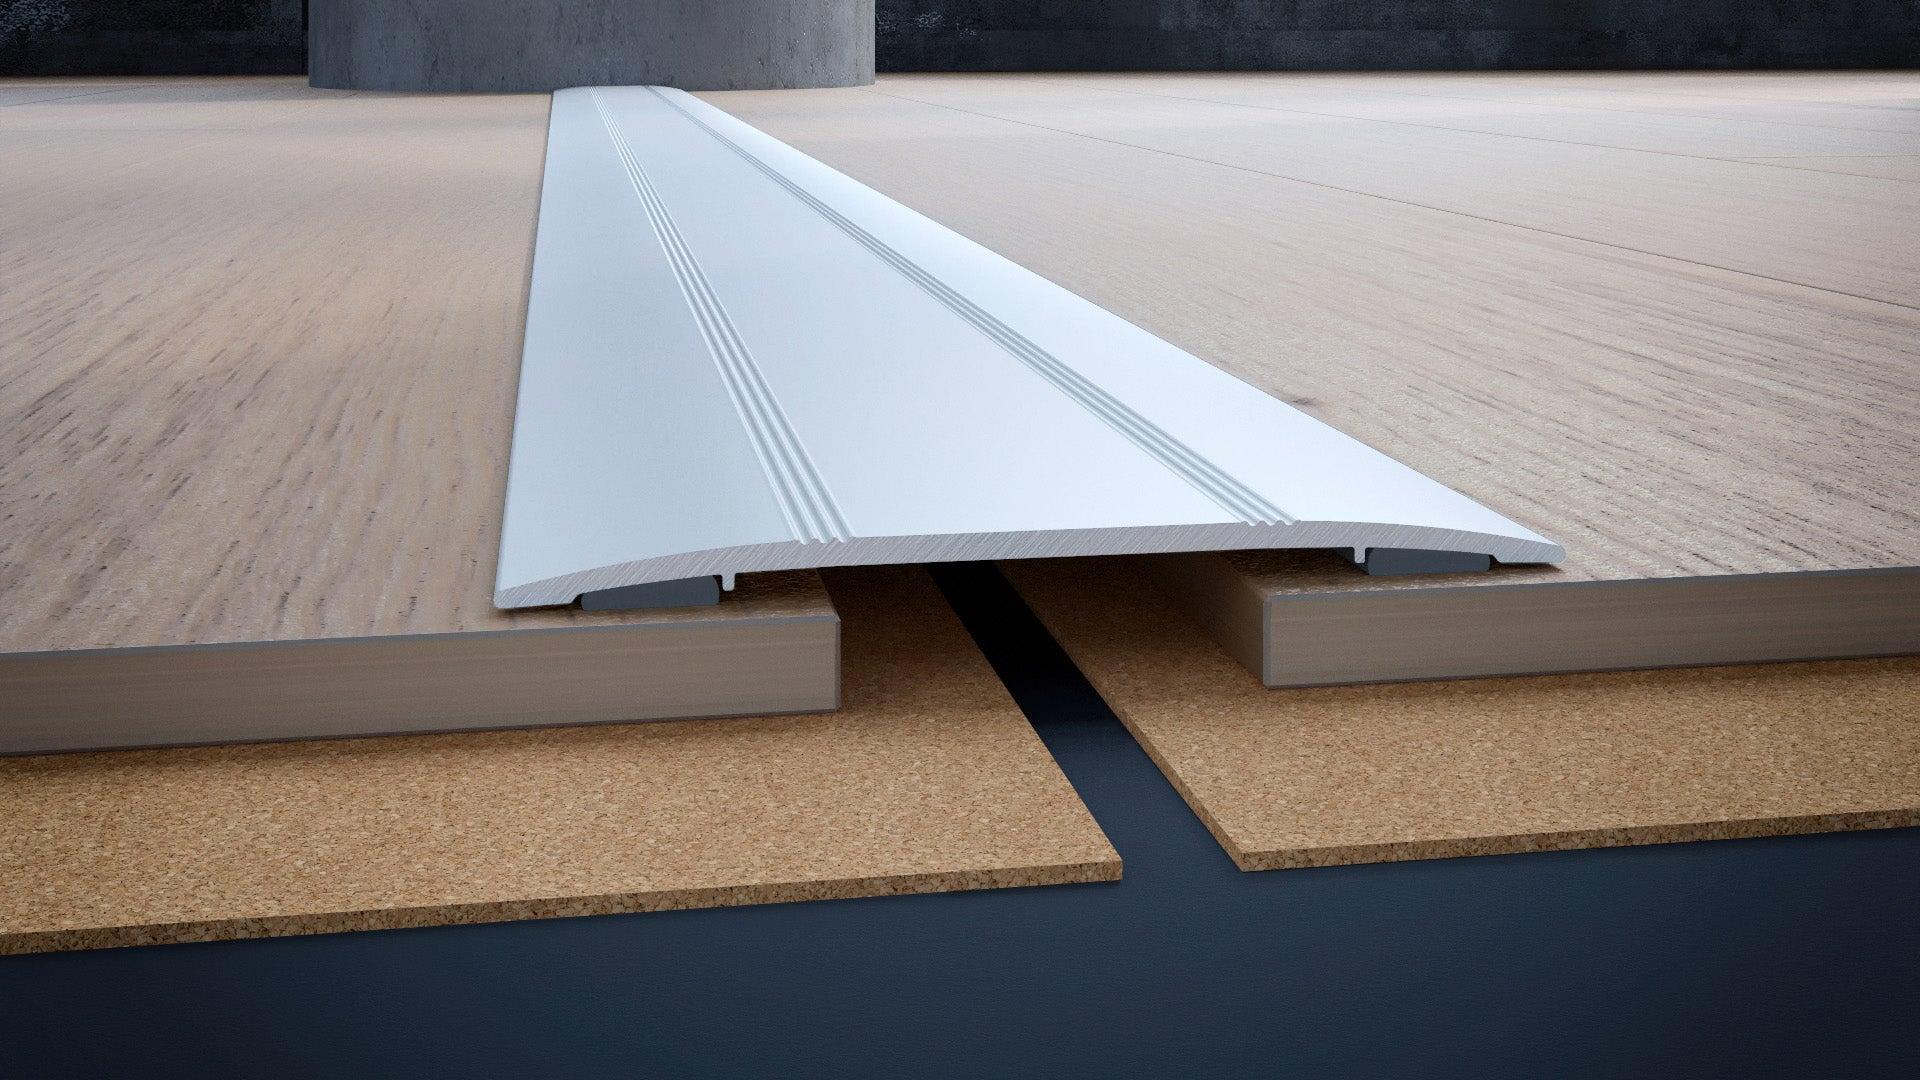 Barre de seuil alu mat, L.270 cm x l.10 mm | Leroy Merlin